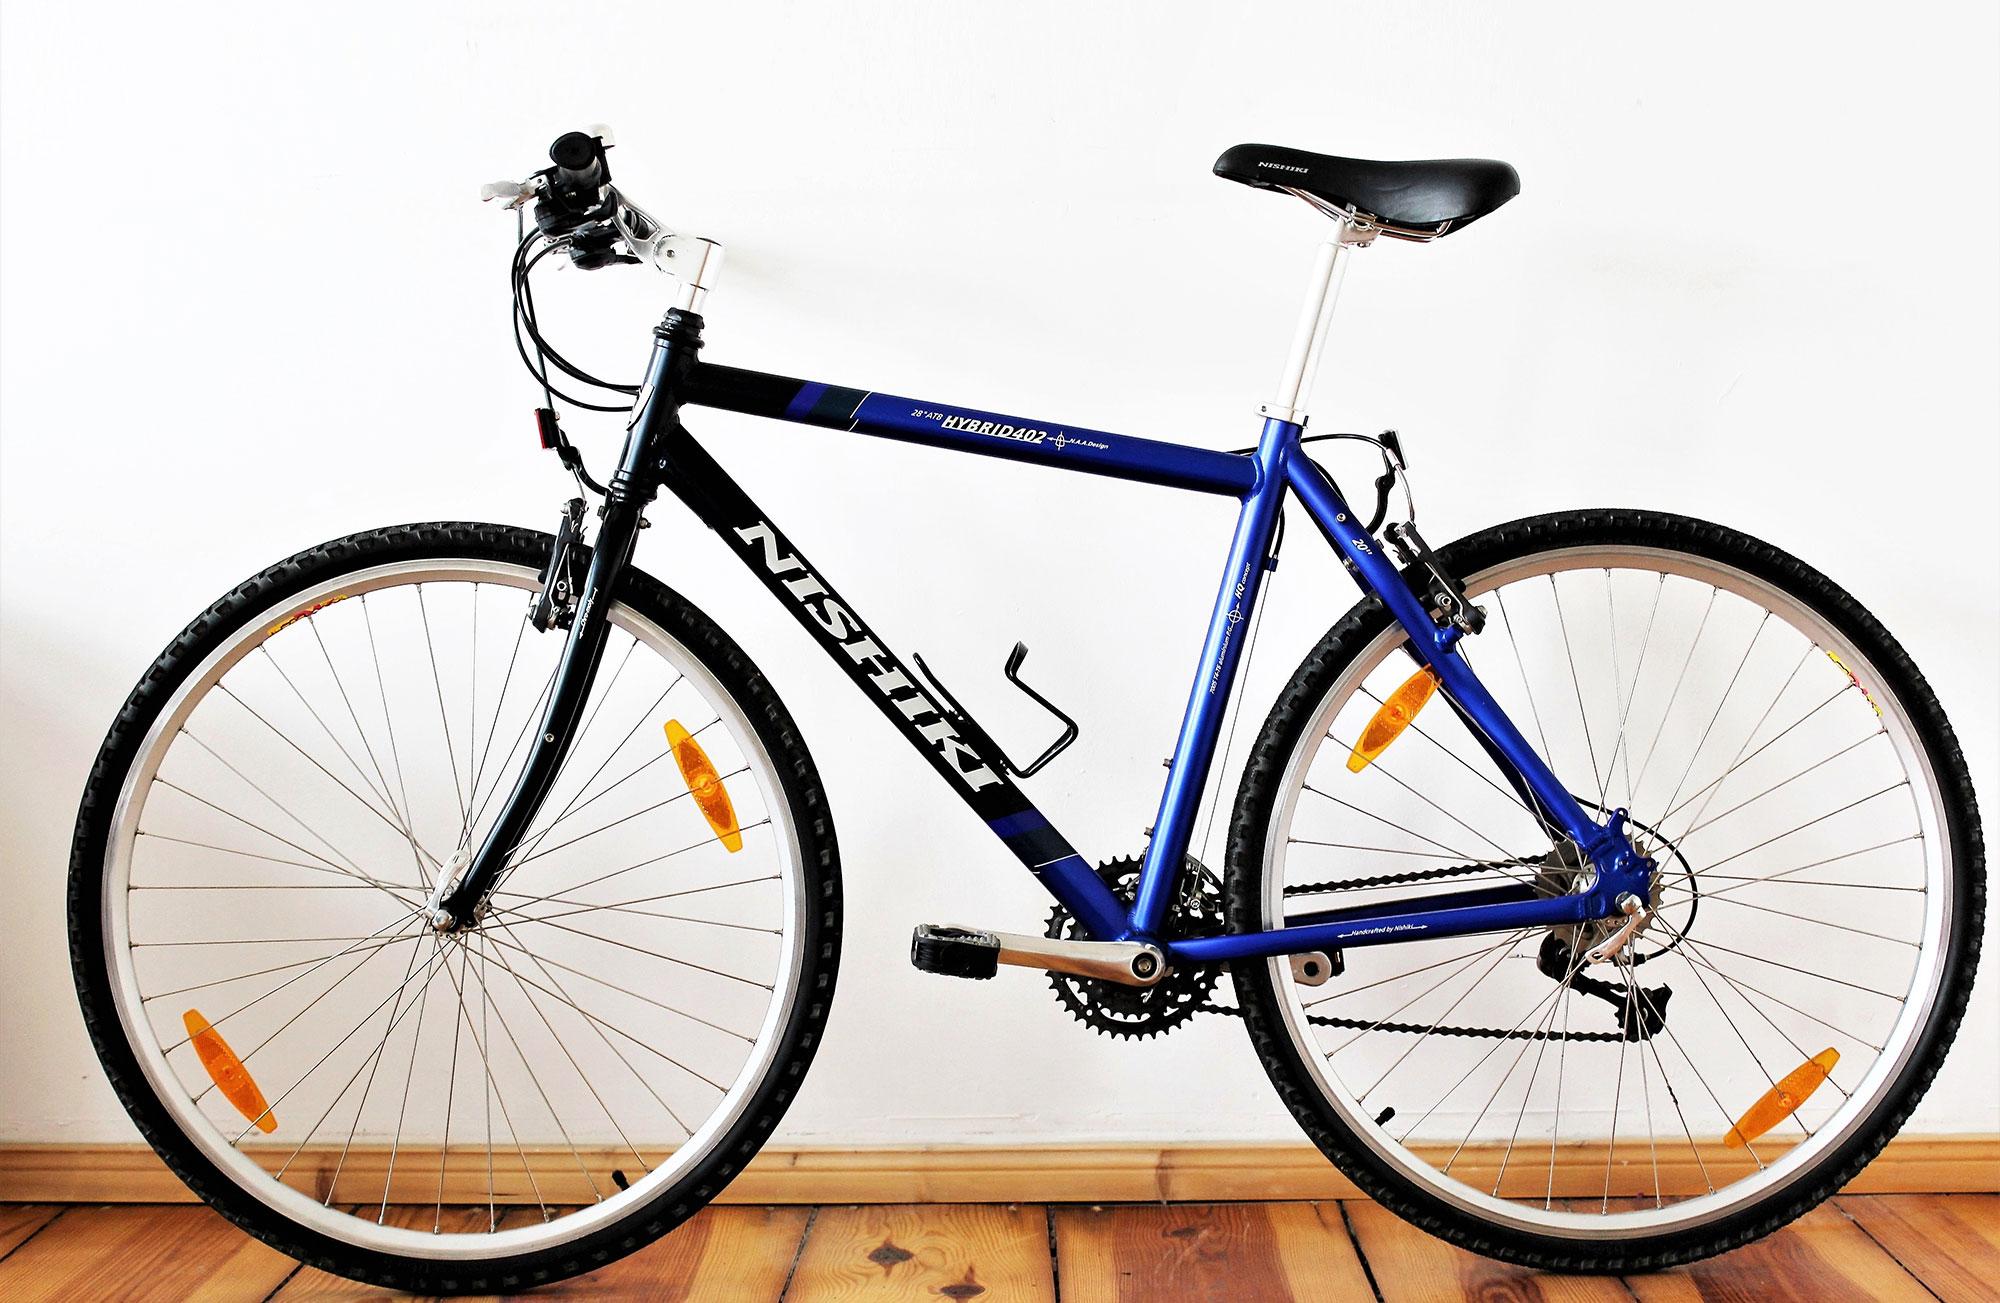 RADVERLEIH - bikegreen